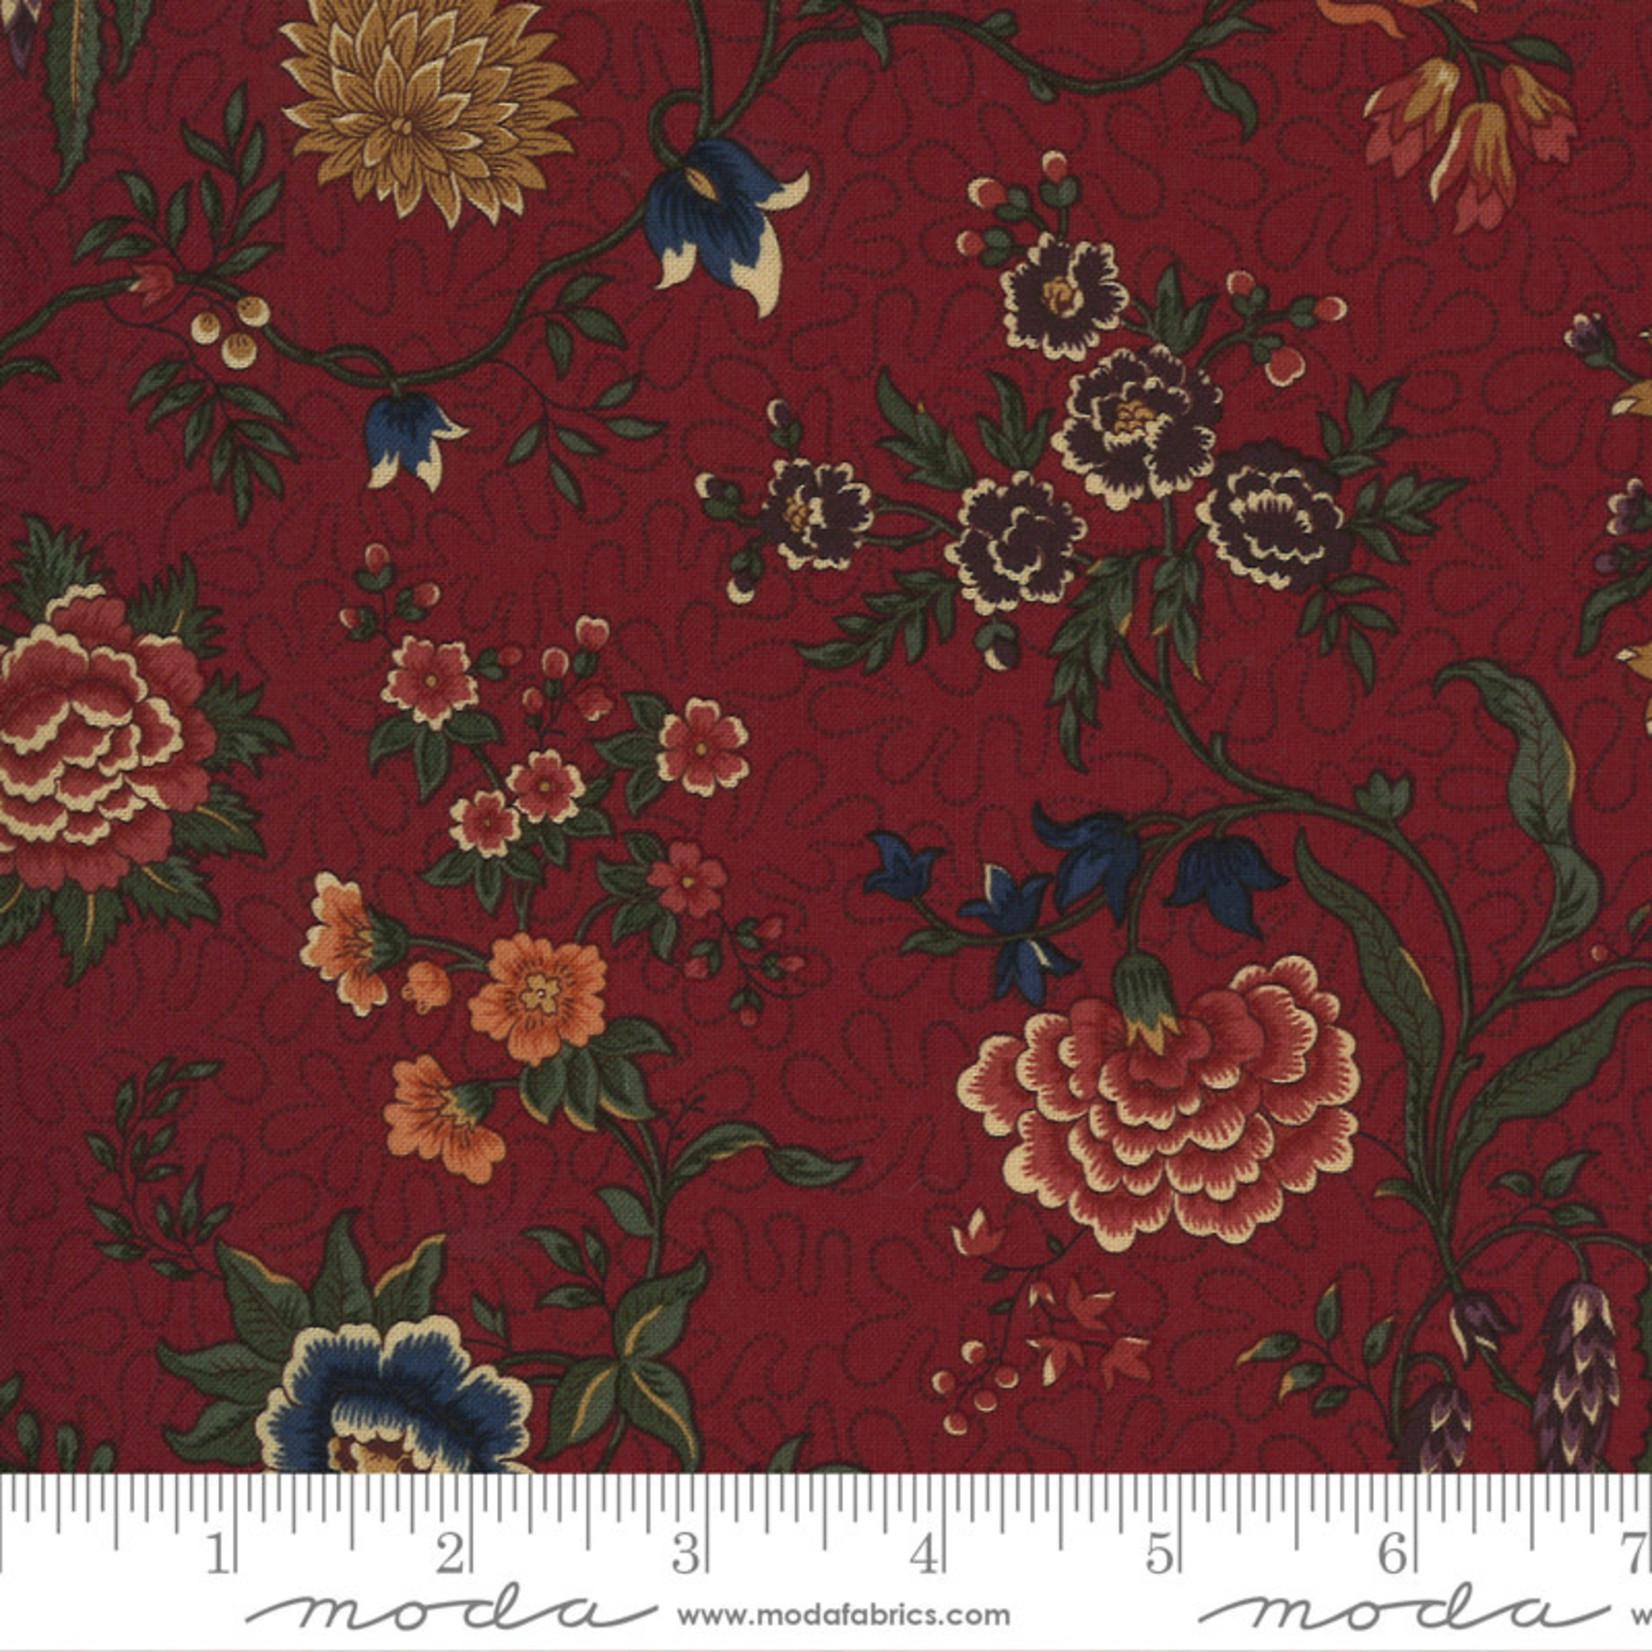 Kansas Troubles Quilters Prairie Dreams, Prairie Flowers Florals, Red 9650 13 $0.20 per cm or $20/m